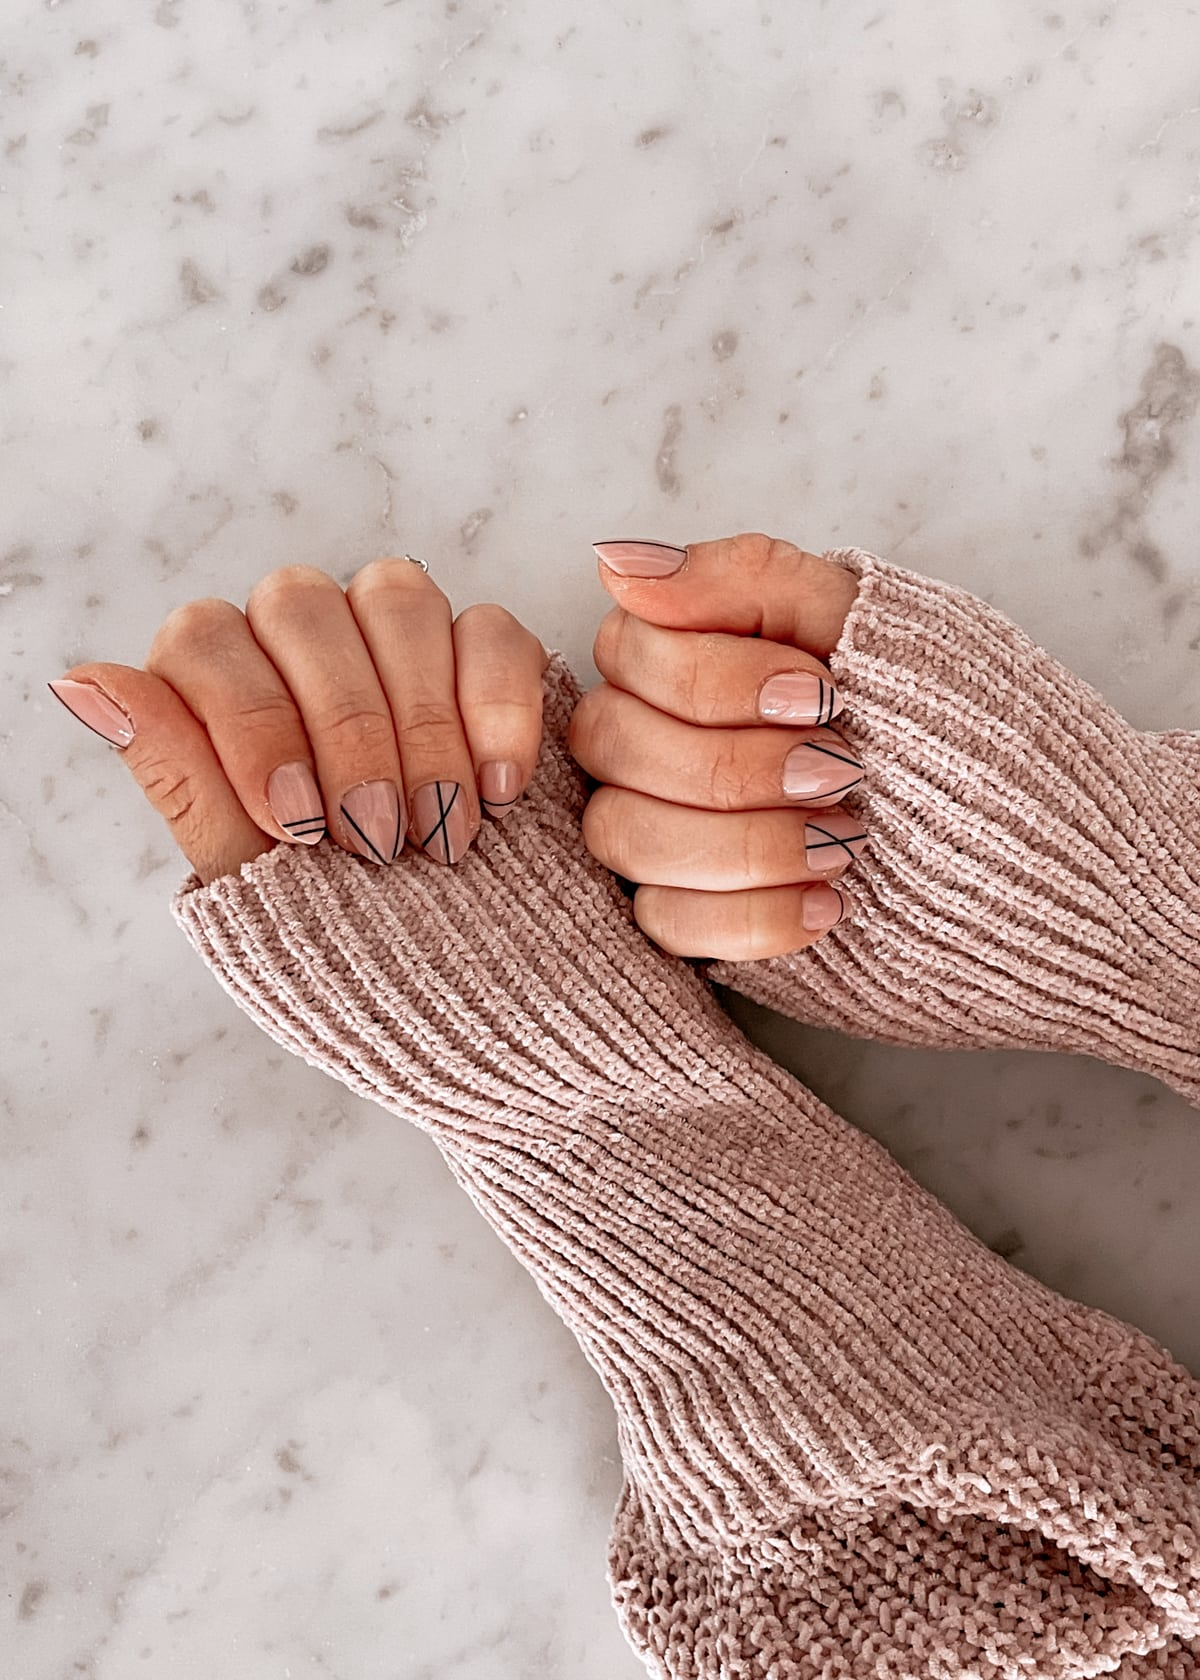 red aspen nails